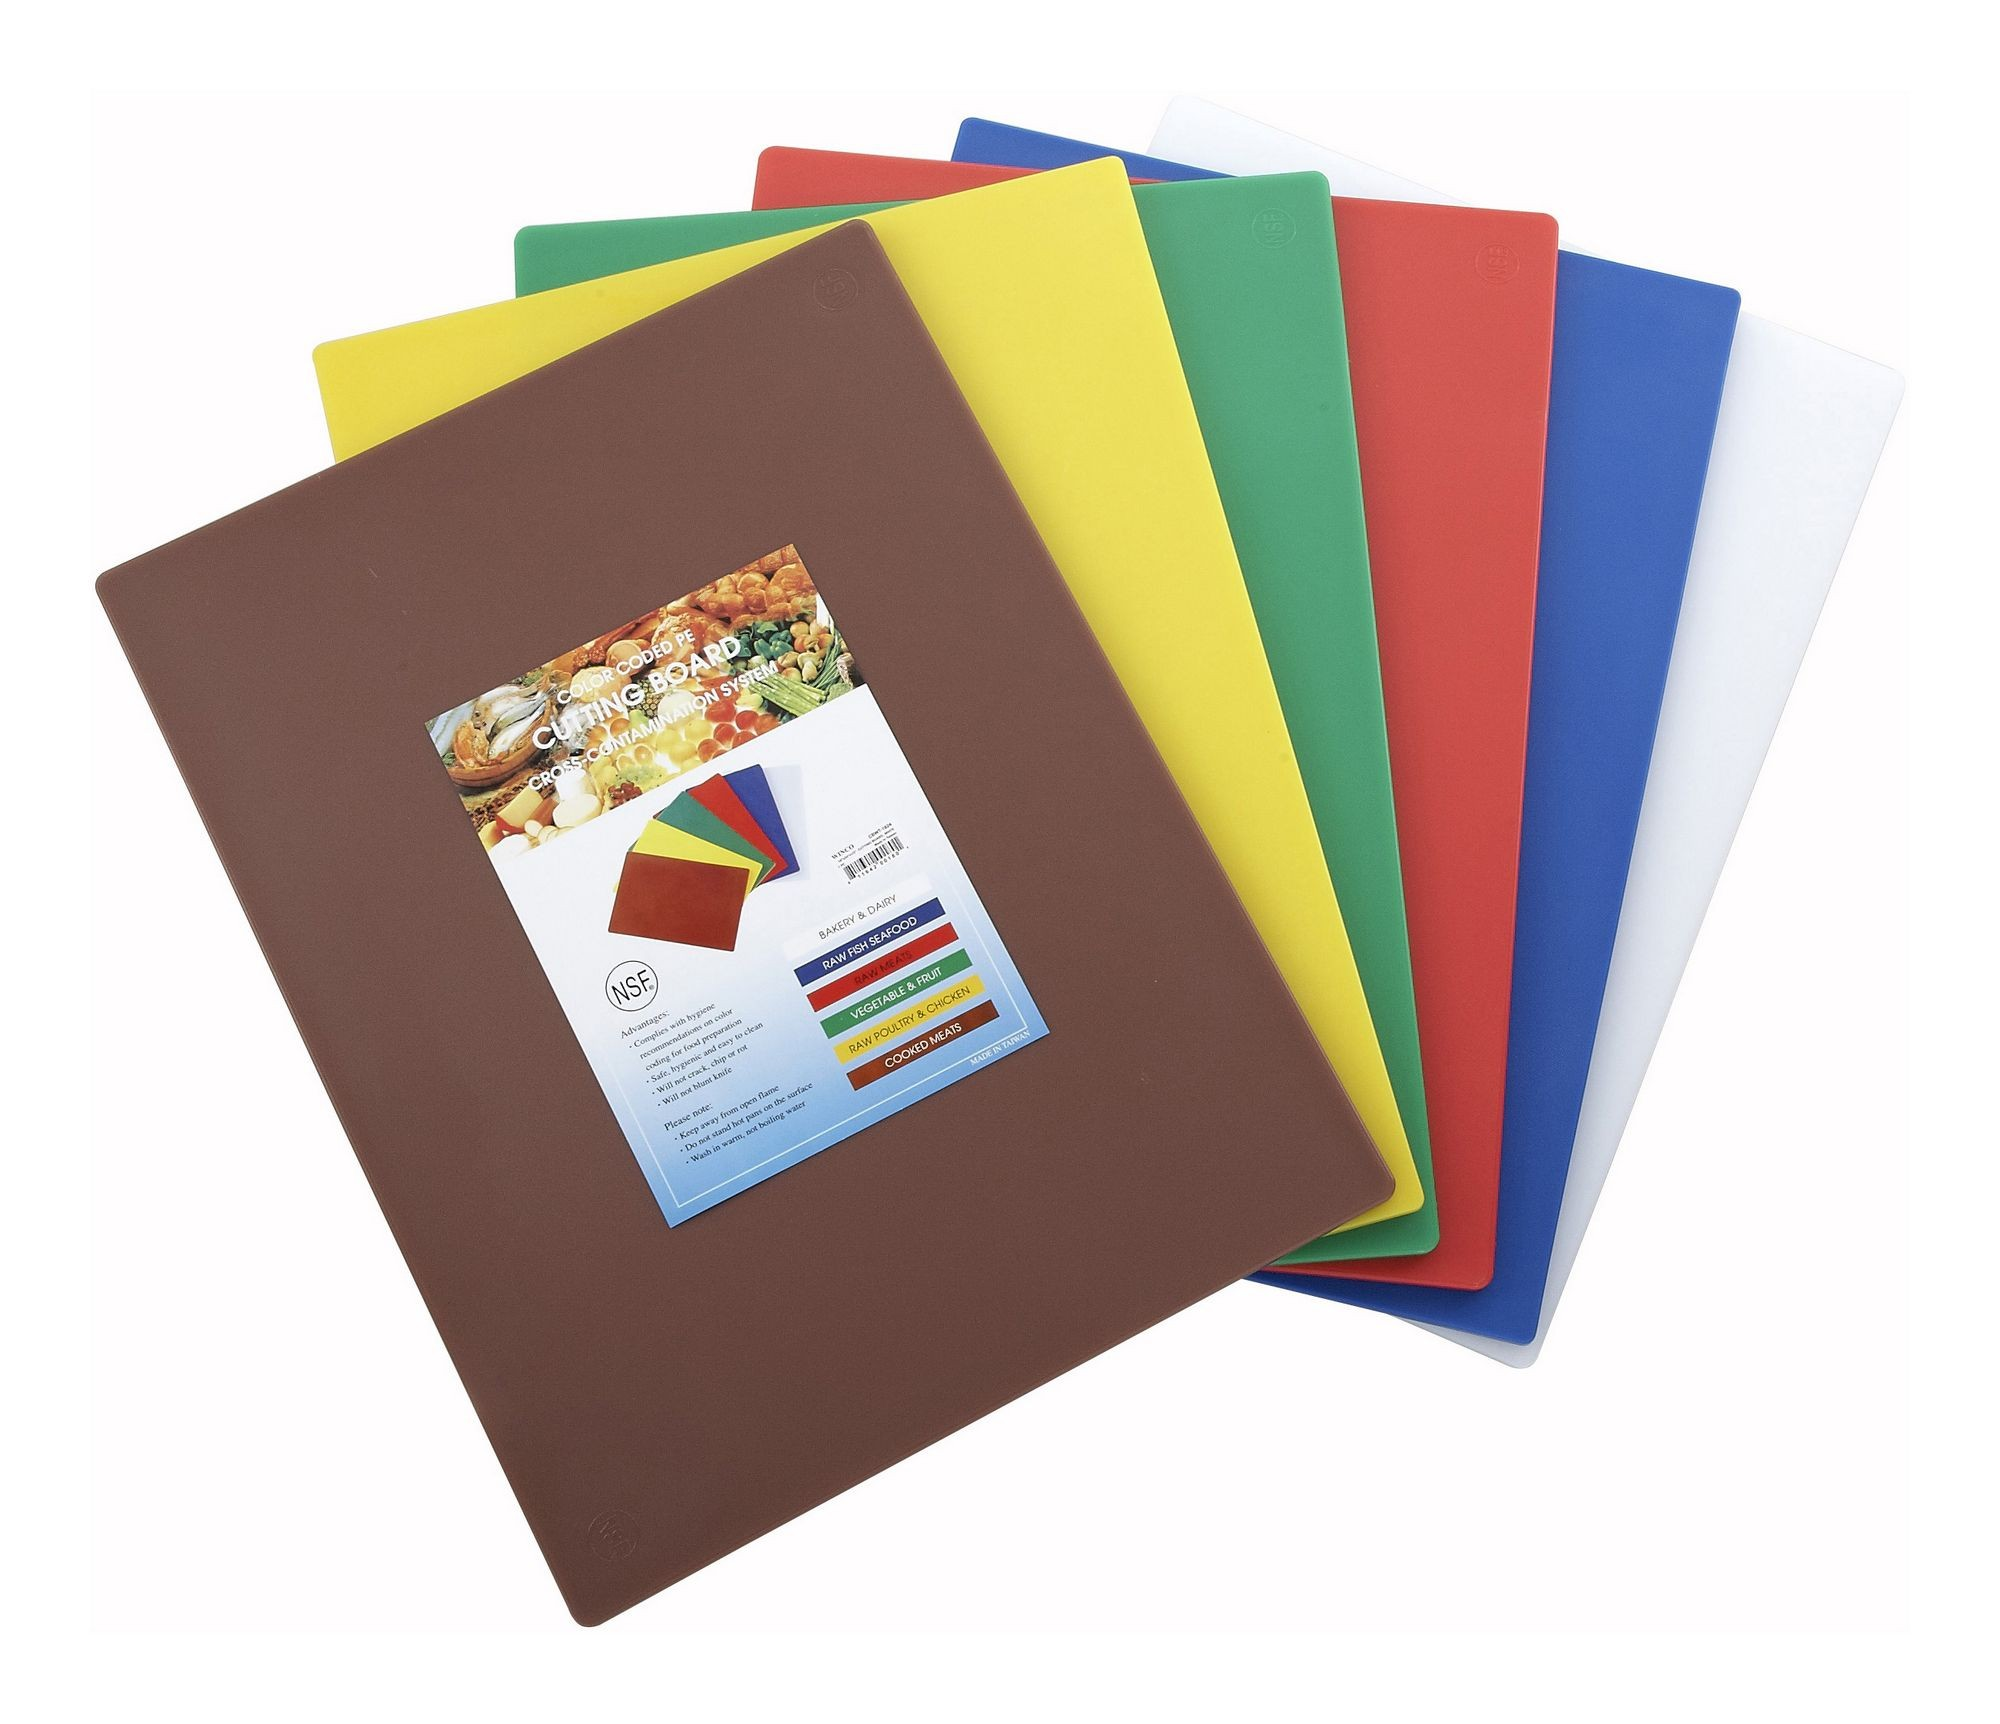 Six-Color Cutting Board Set - 18 X 24 X 1/2